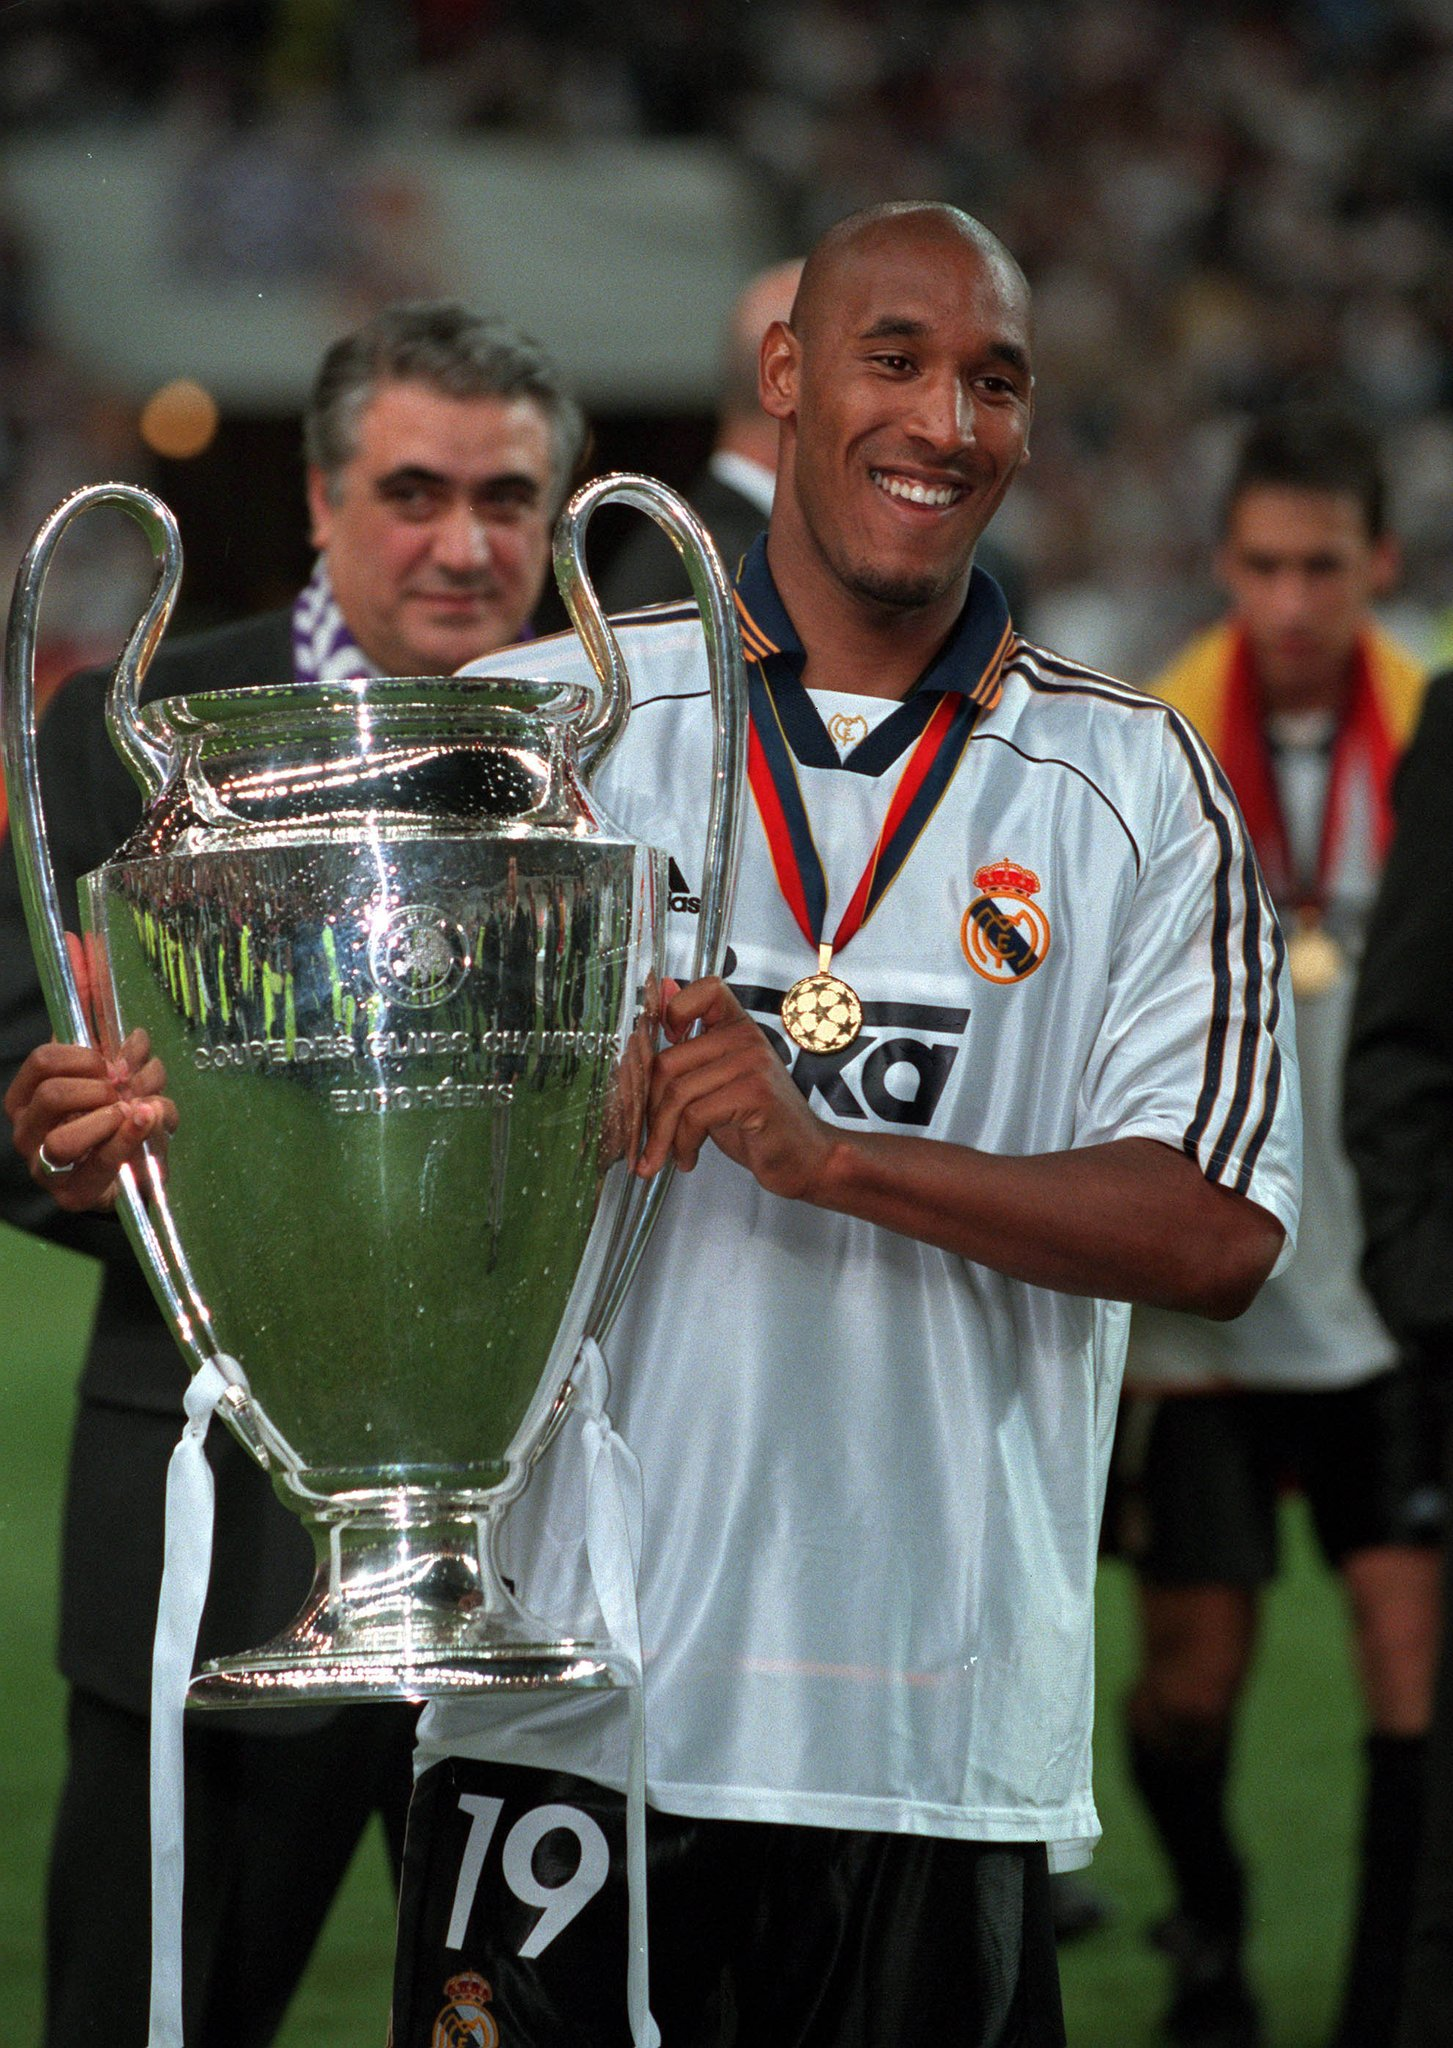 Happy birthday, former Real Madrid star & winner Nicolas Anelka!